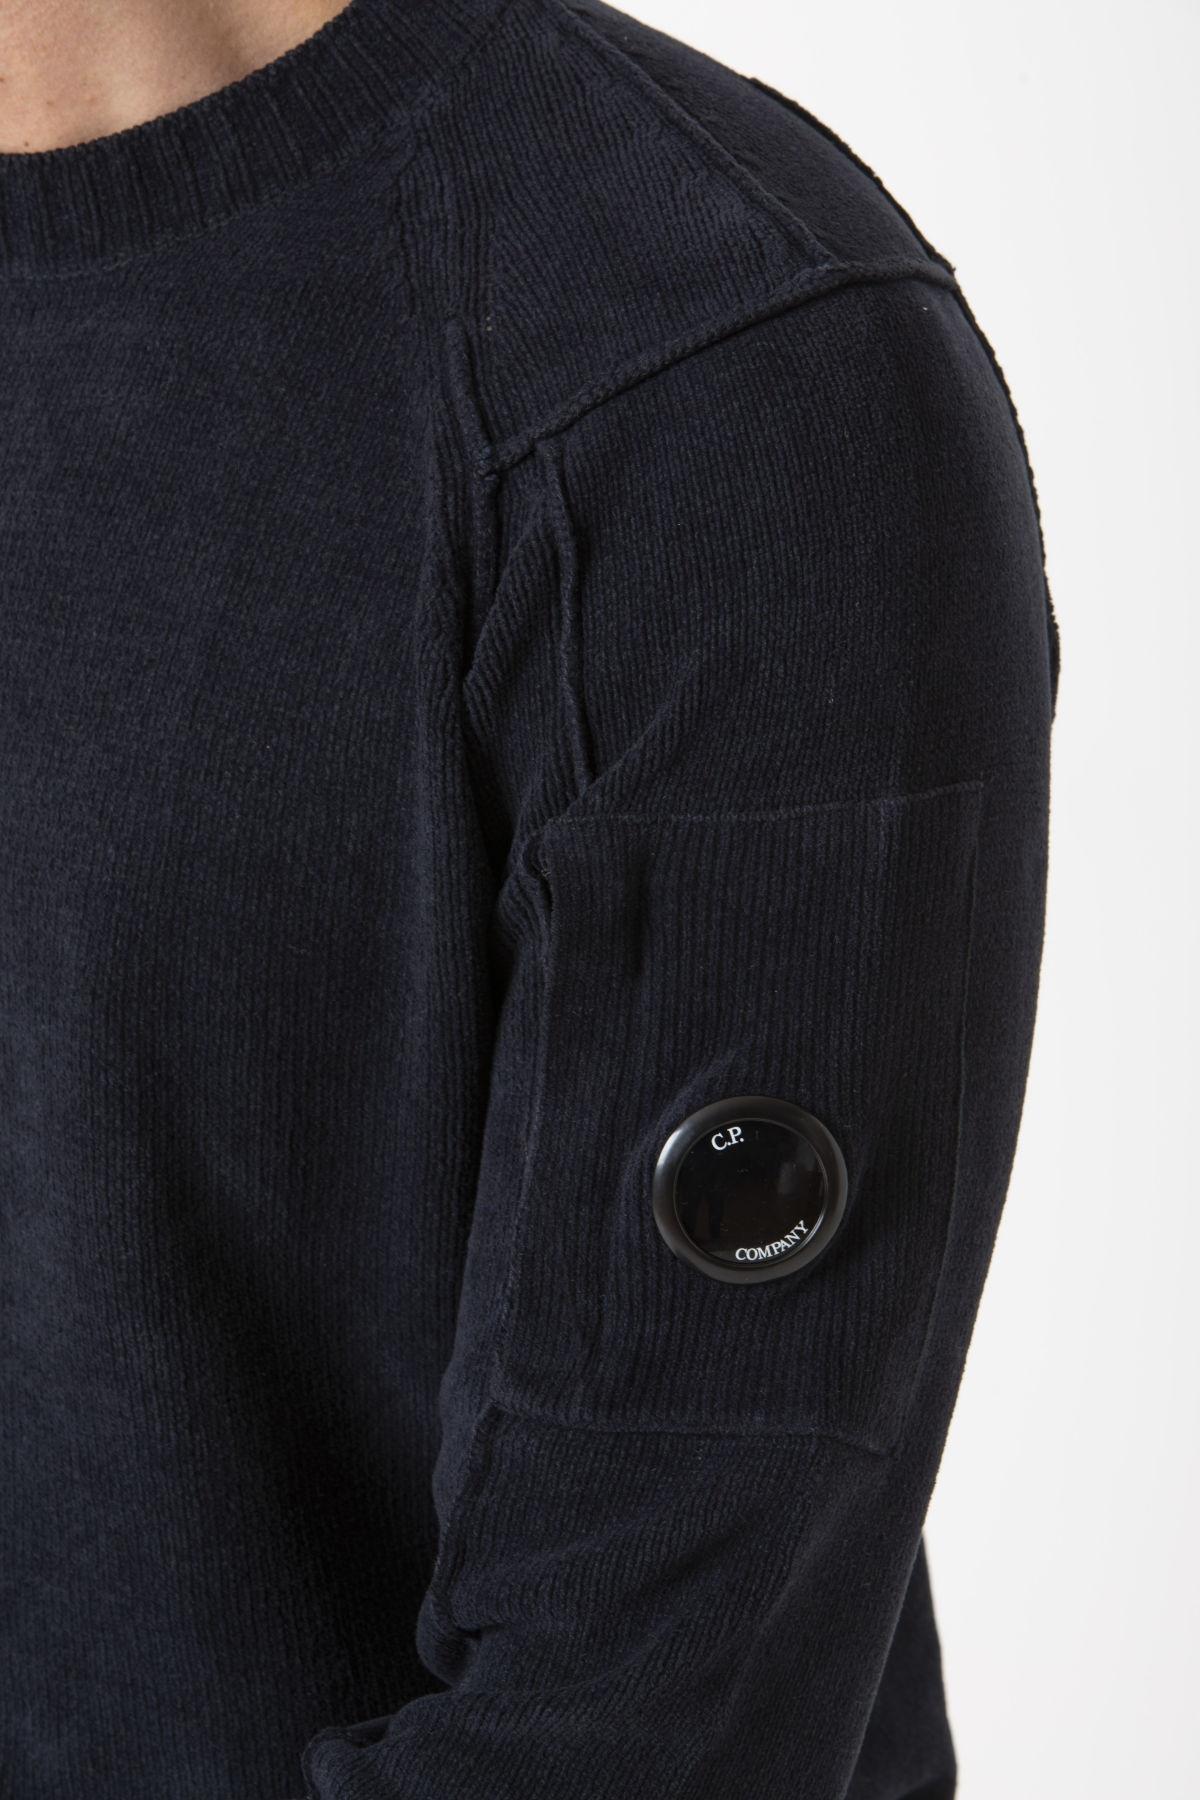 Pullover for man C.P. COMPANY F/W 19-20